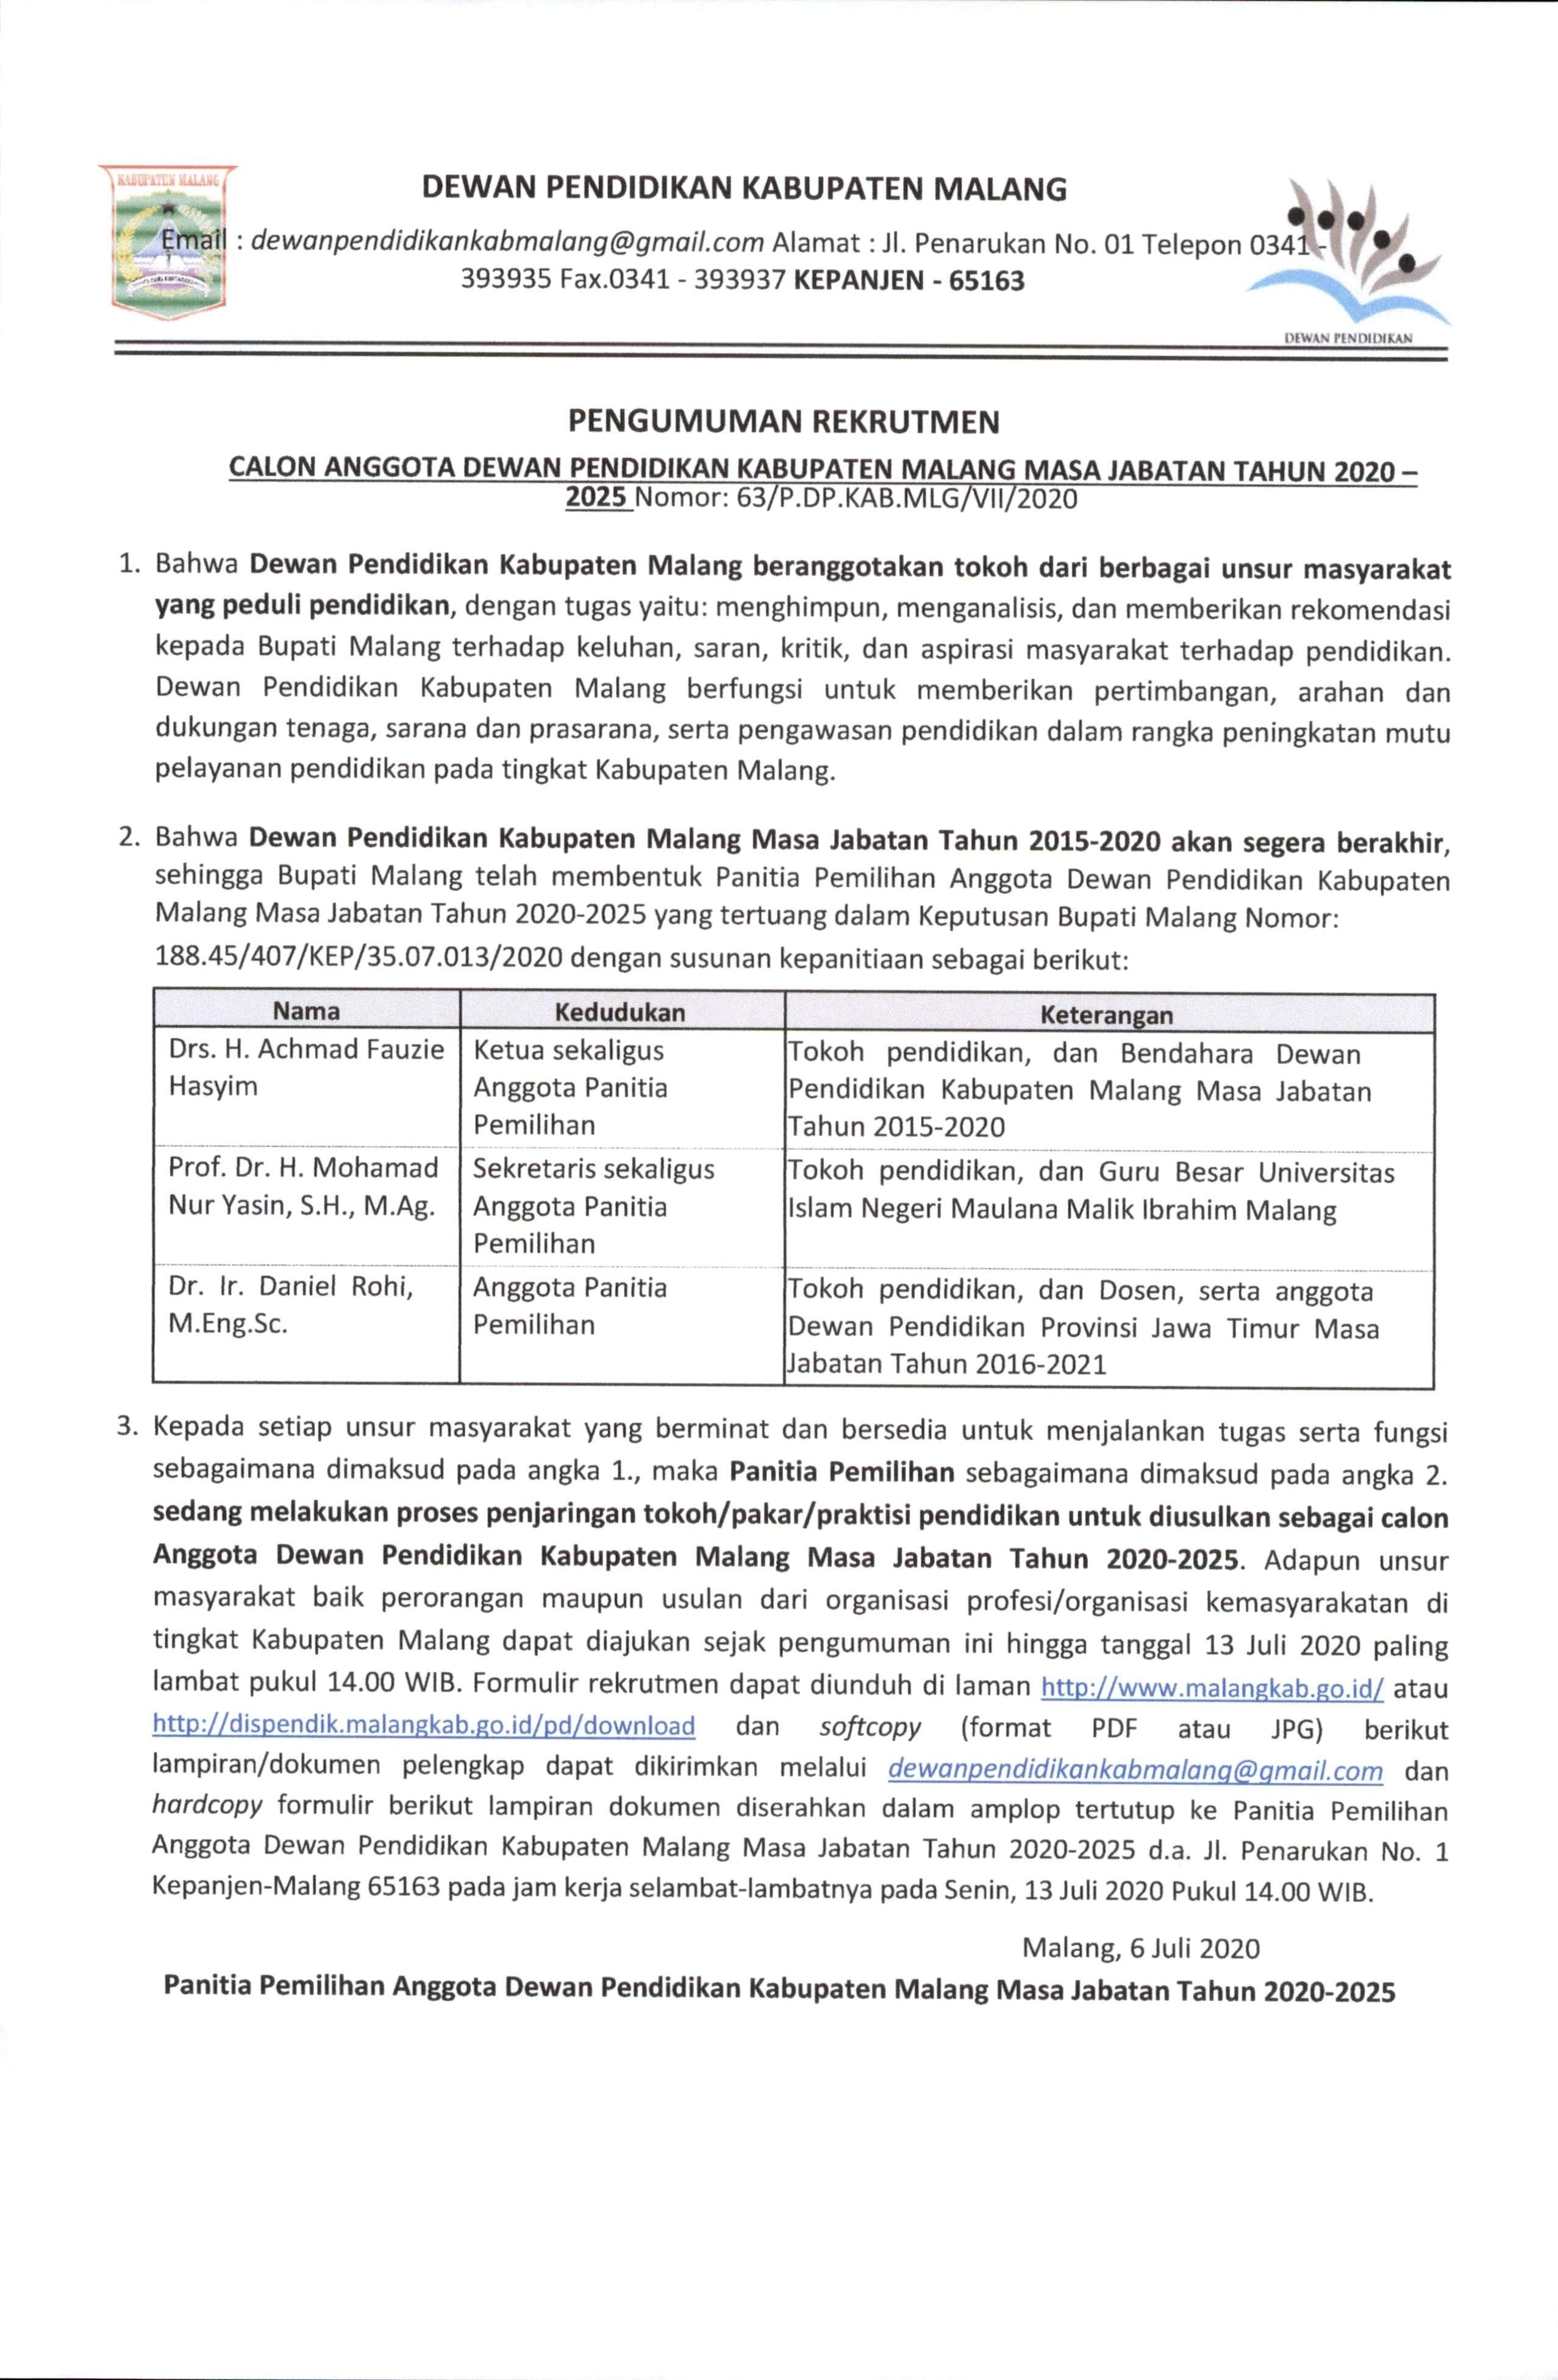 Pengumuman Calon Anggota Dewan Pendidikan Kabupaten Malang Masa Jabatan Tahun 2020 - 2025